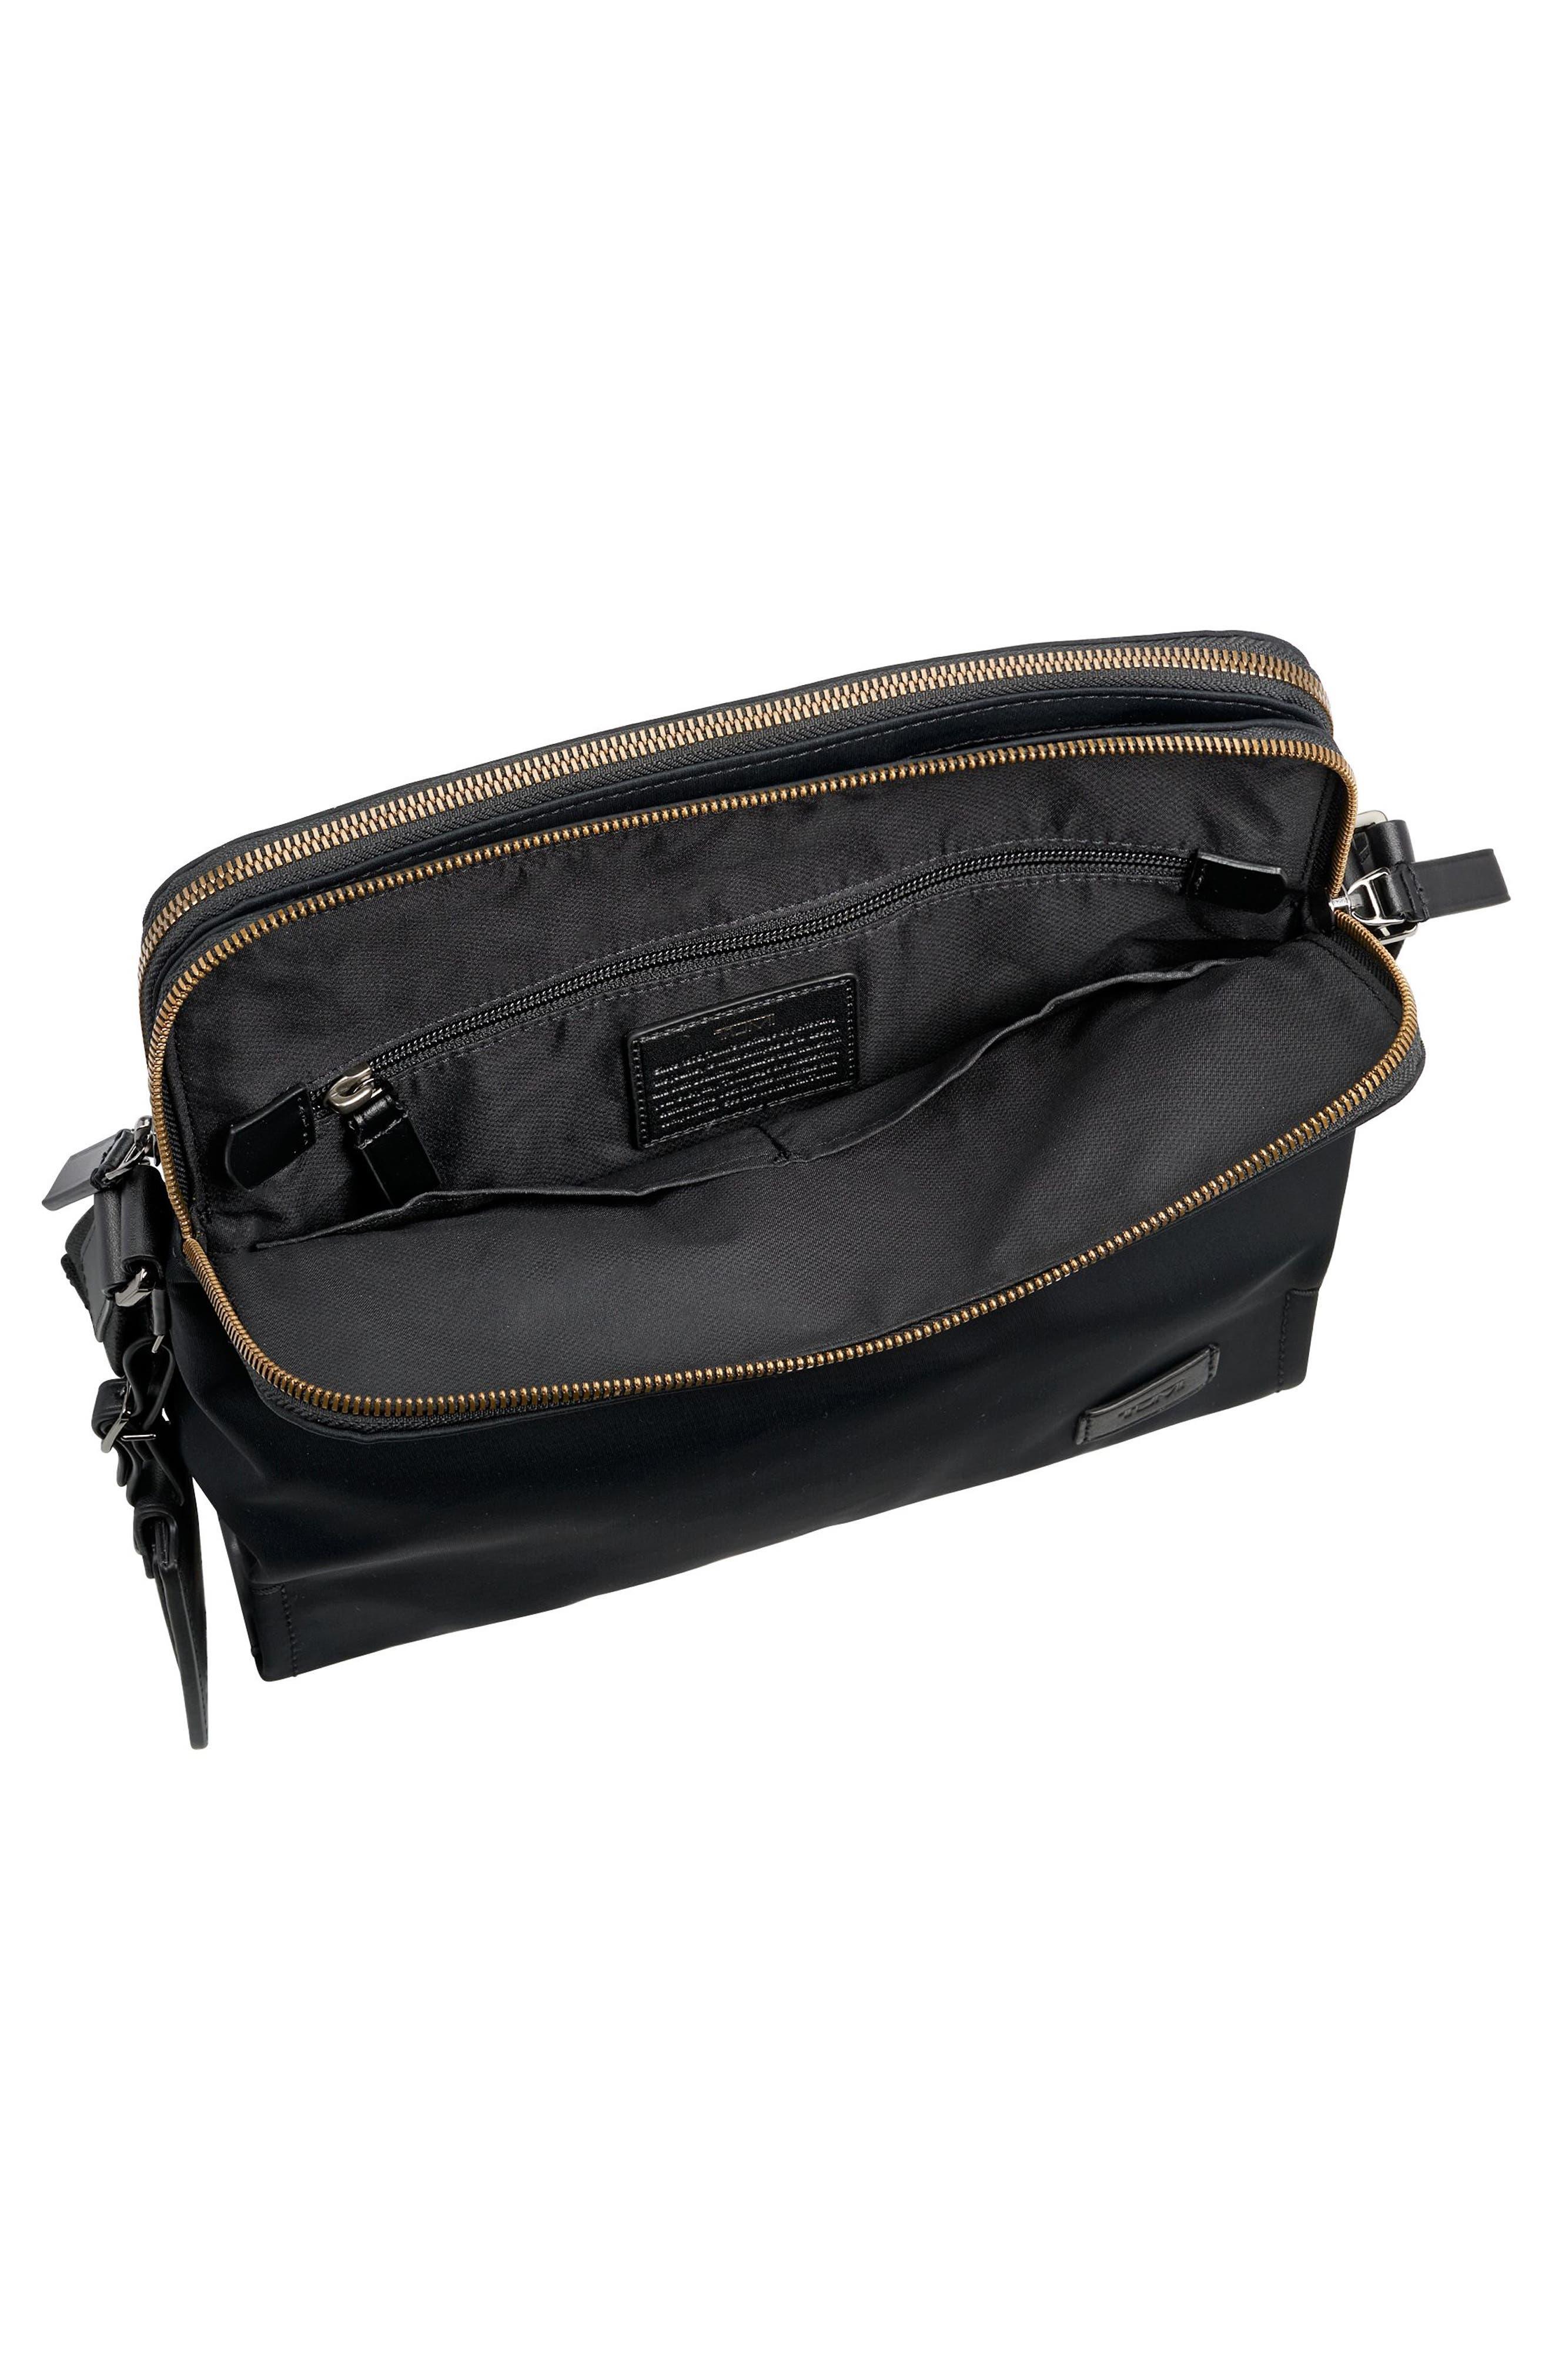 Harrison Stratton Messenger Bag,                             Alternate thumbnail 3, color,                             Black Nylon